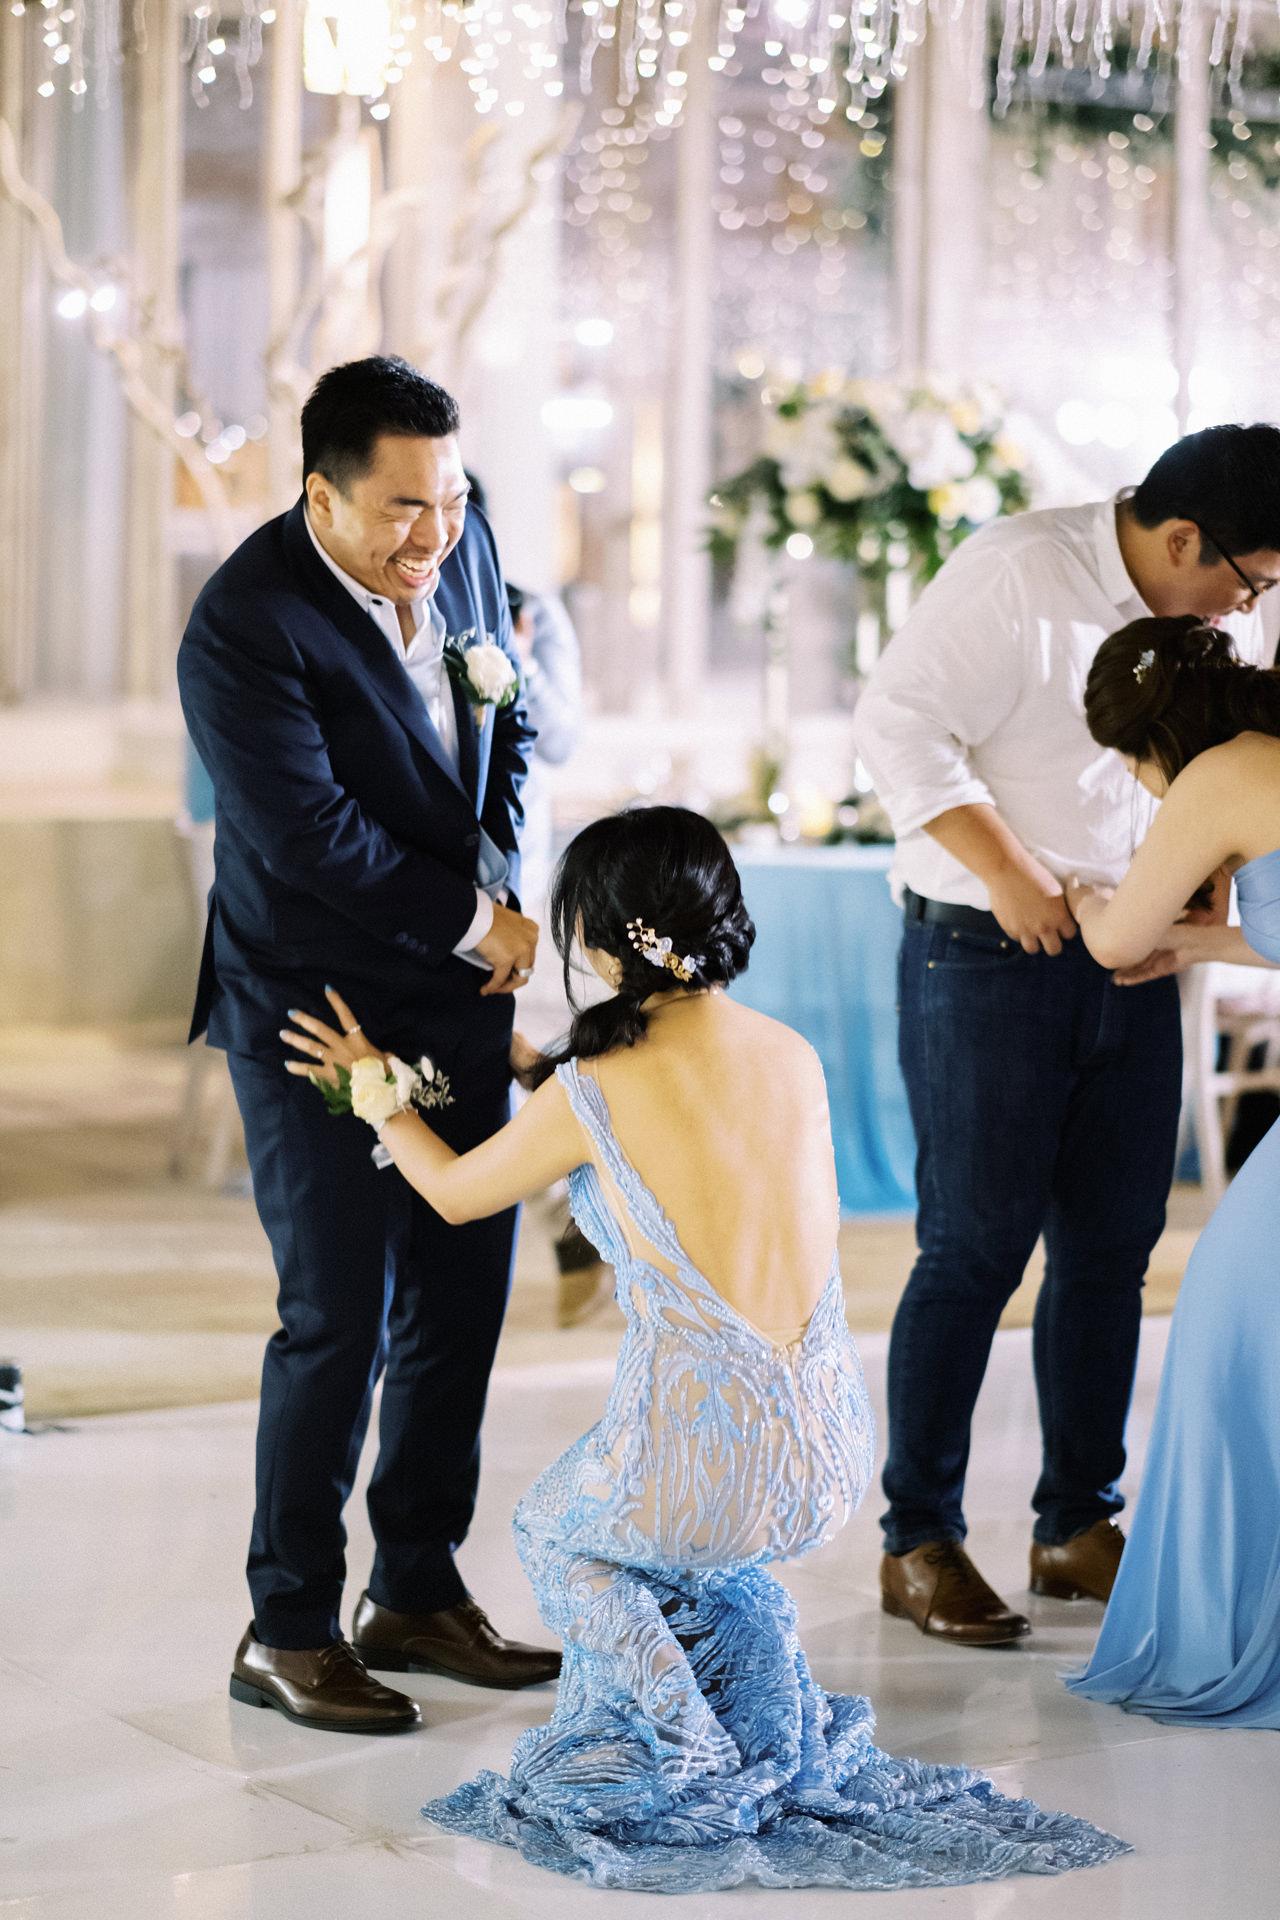 M&S: Shades of Blue Villa Plenilunio Bali Wedding 102